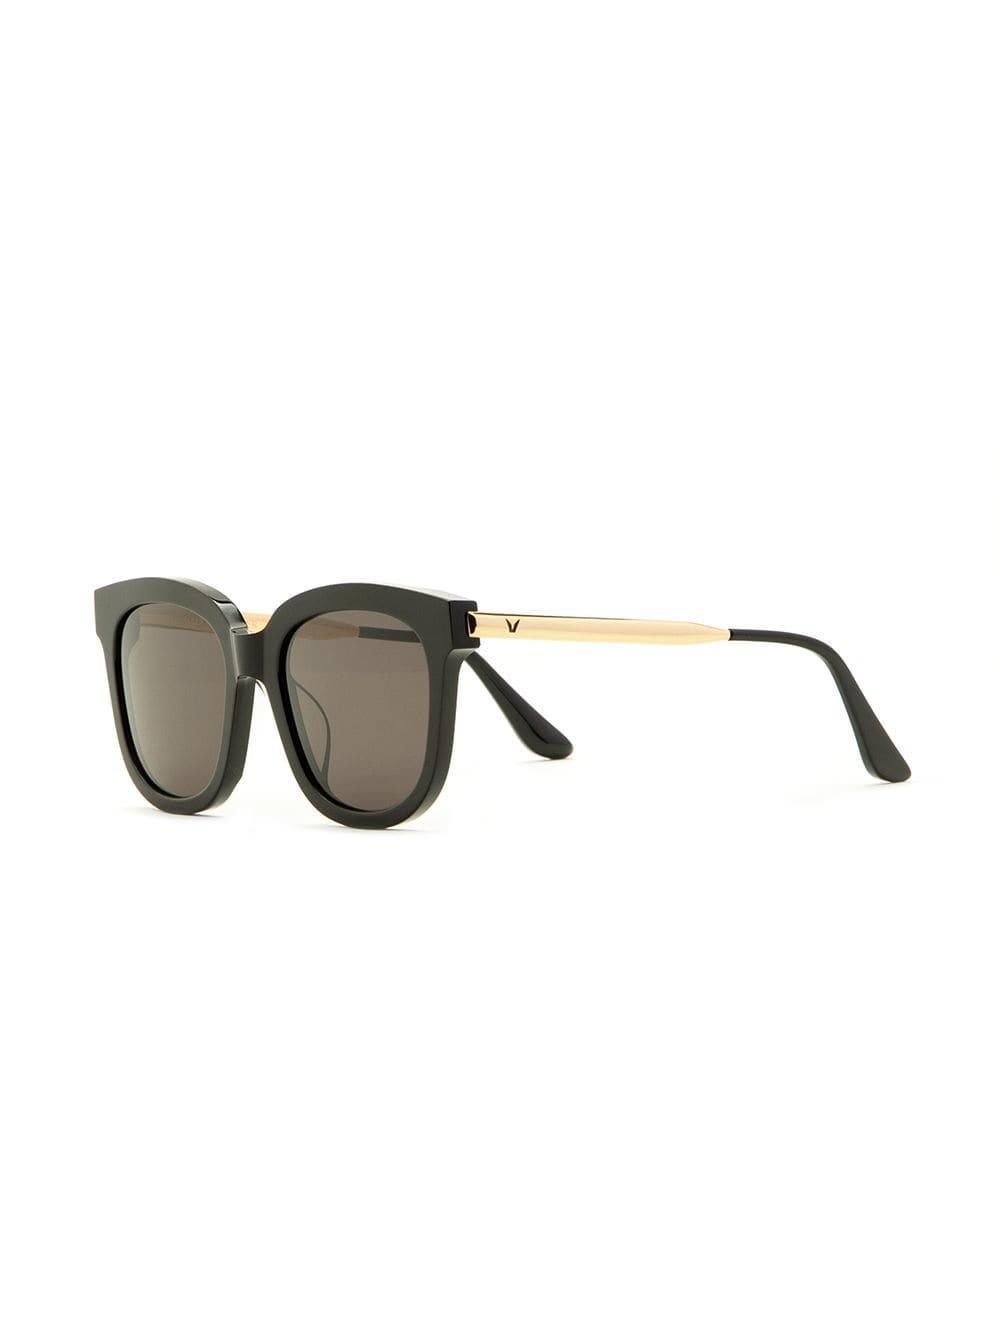 819b7fb159 Gentle Monster Absente 01gd Sunglasses in Black - Lyst